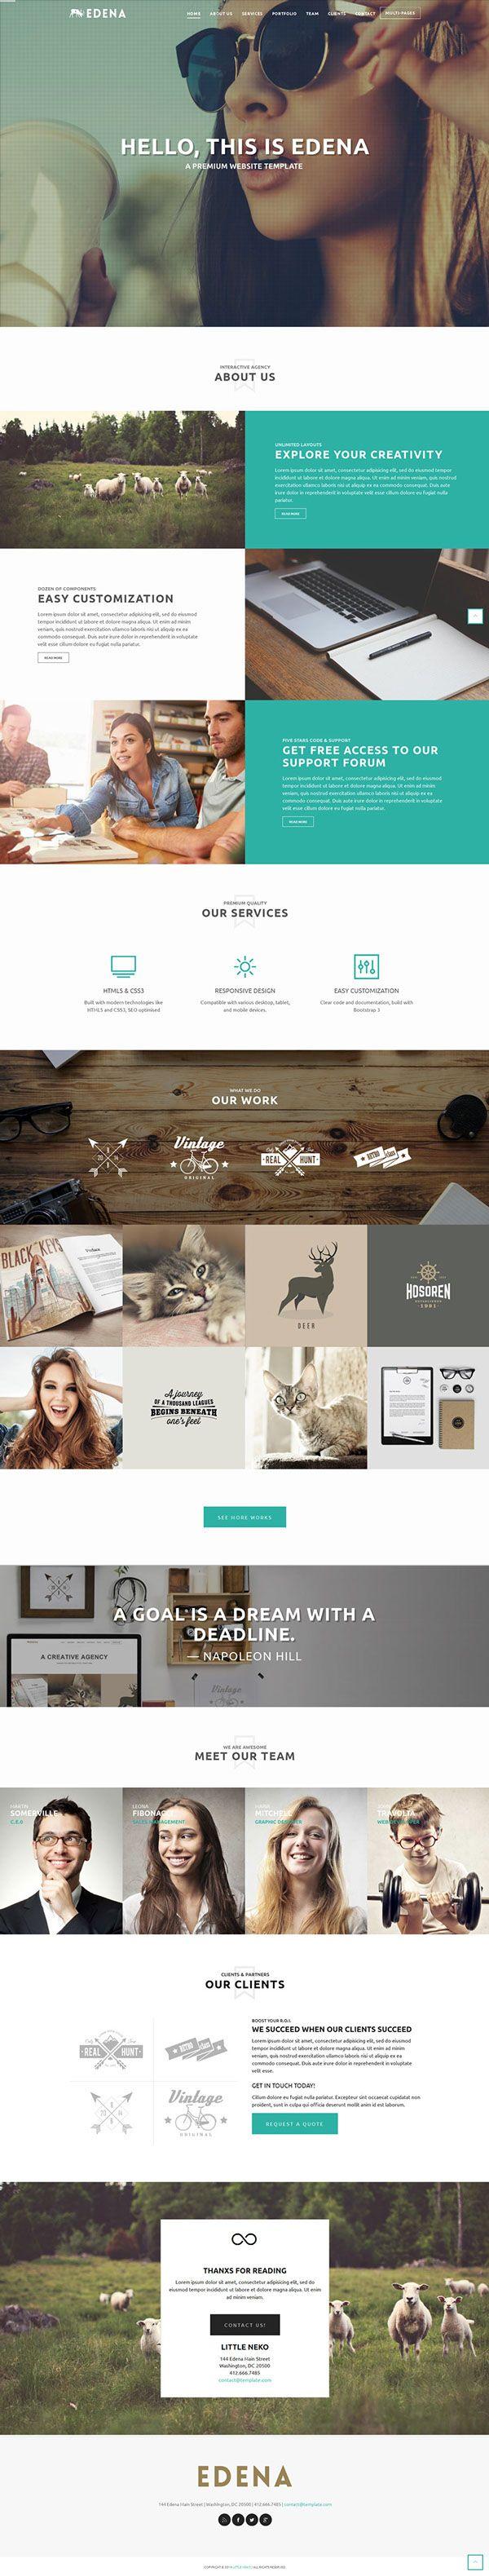 https://www.behance.net/gallery/22538223/EDENA-Creative-Template-One-page-option